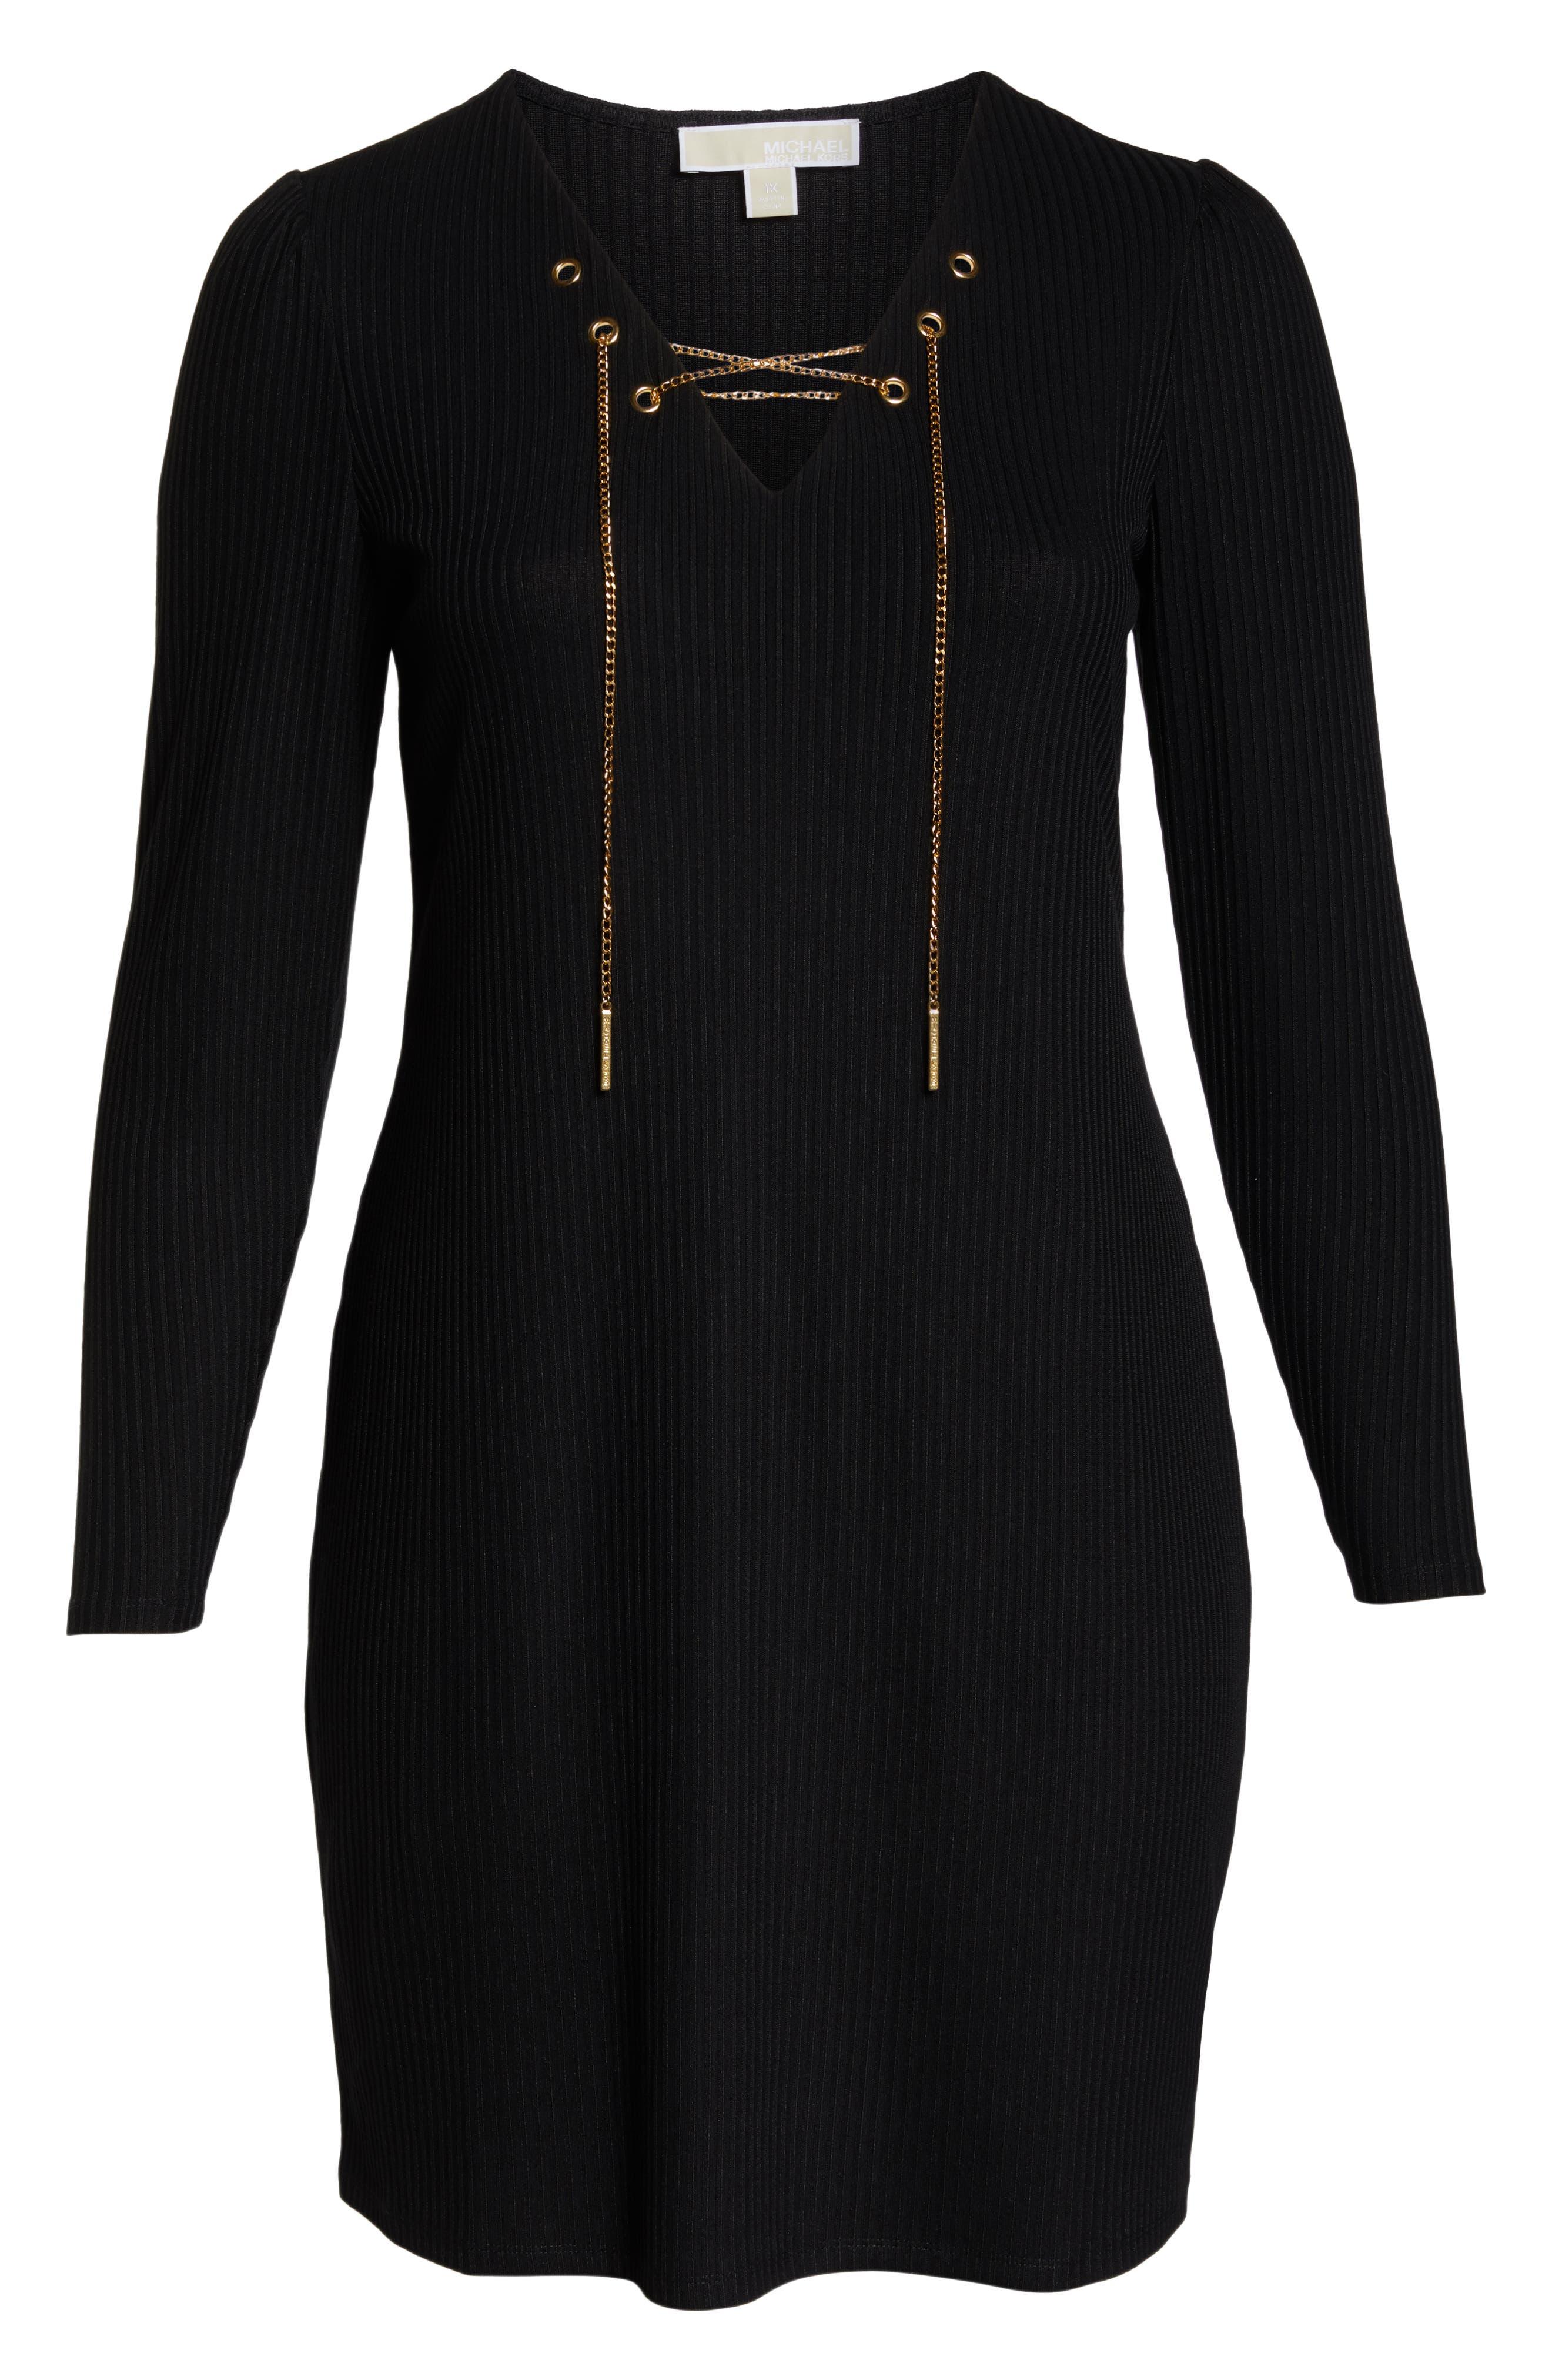 MICHAEL MICHAEL KORS, Chain Lace-Up V-Neck Sweater Dress, Alternate thumbnail 7, color, 001